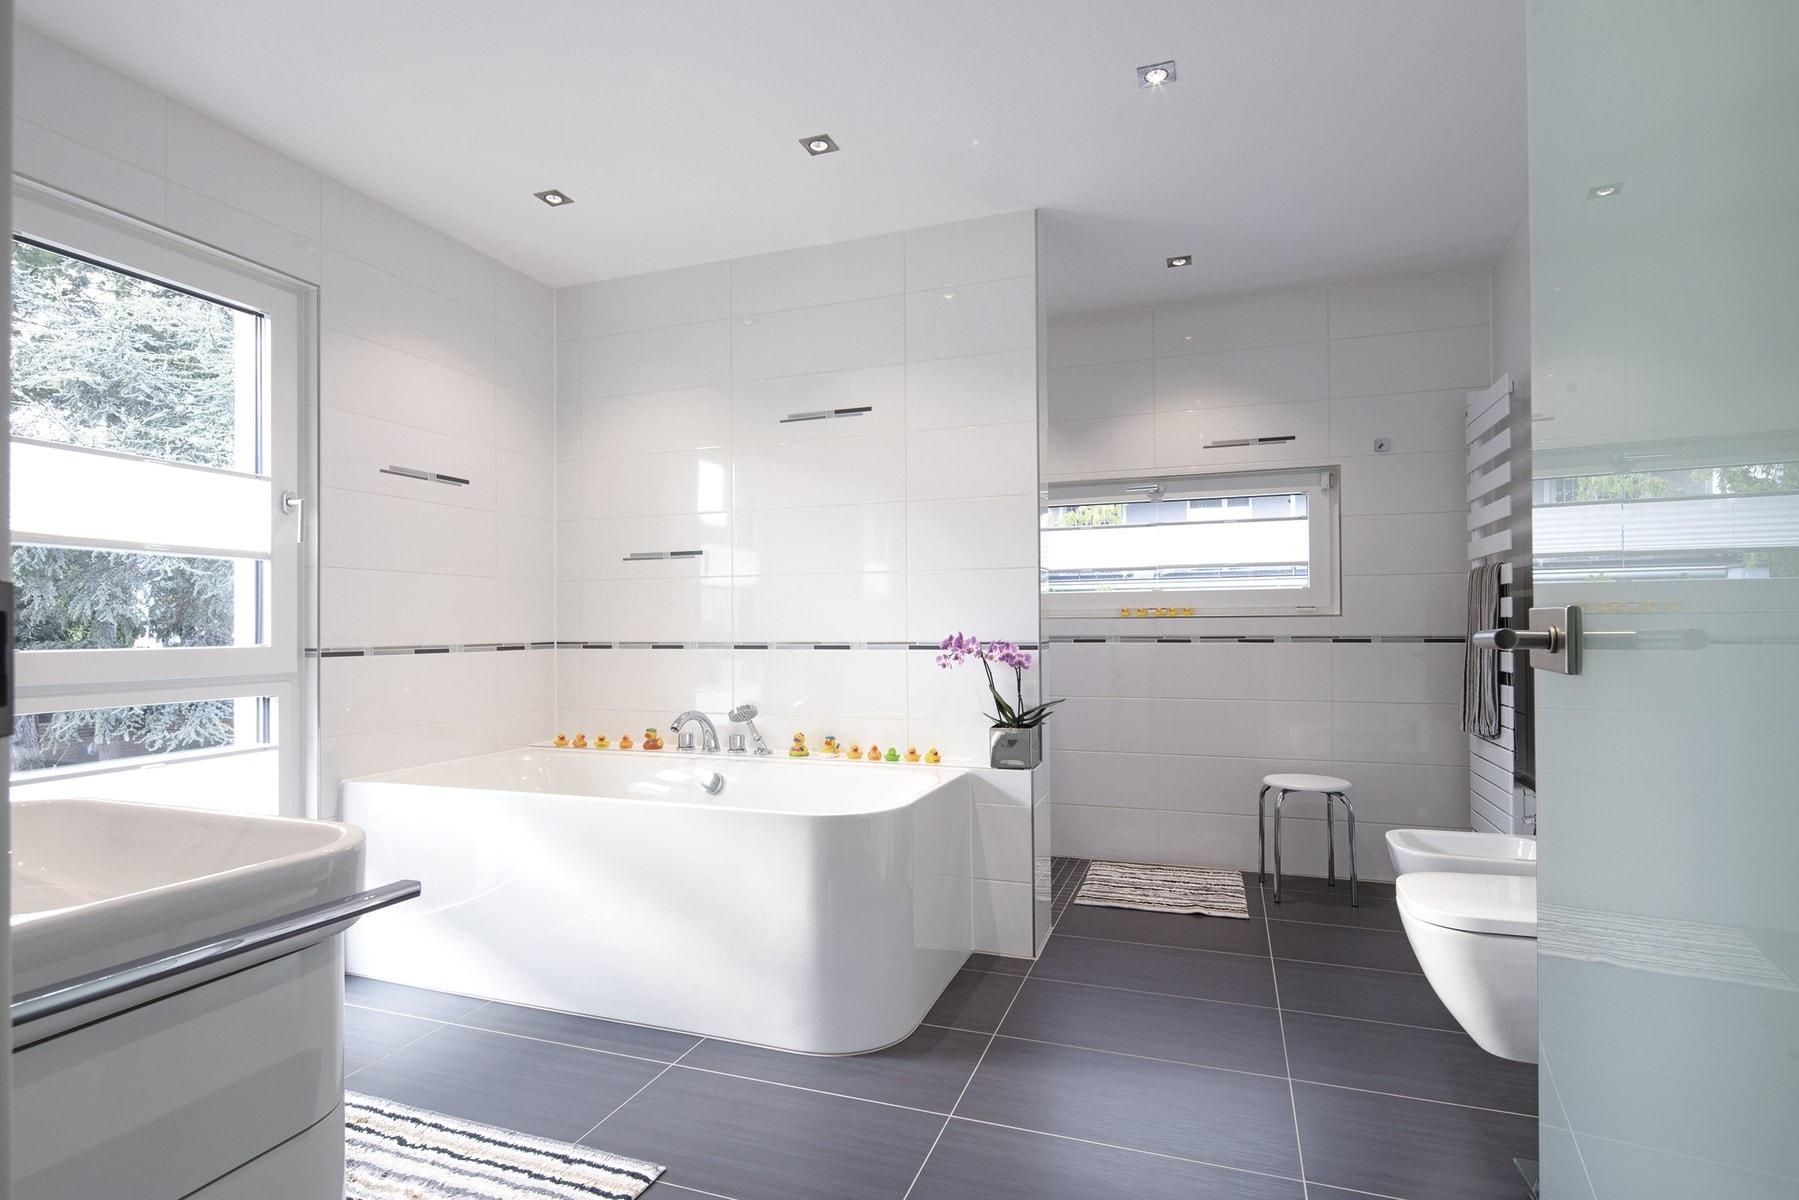 Modernes Badezimmer mit Badewanne - Stadtvilla Inneneinrichtung Haus Ideen Fertighaus CityLife WeberHaus - HausbauDirekt.de